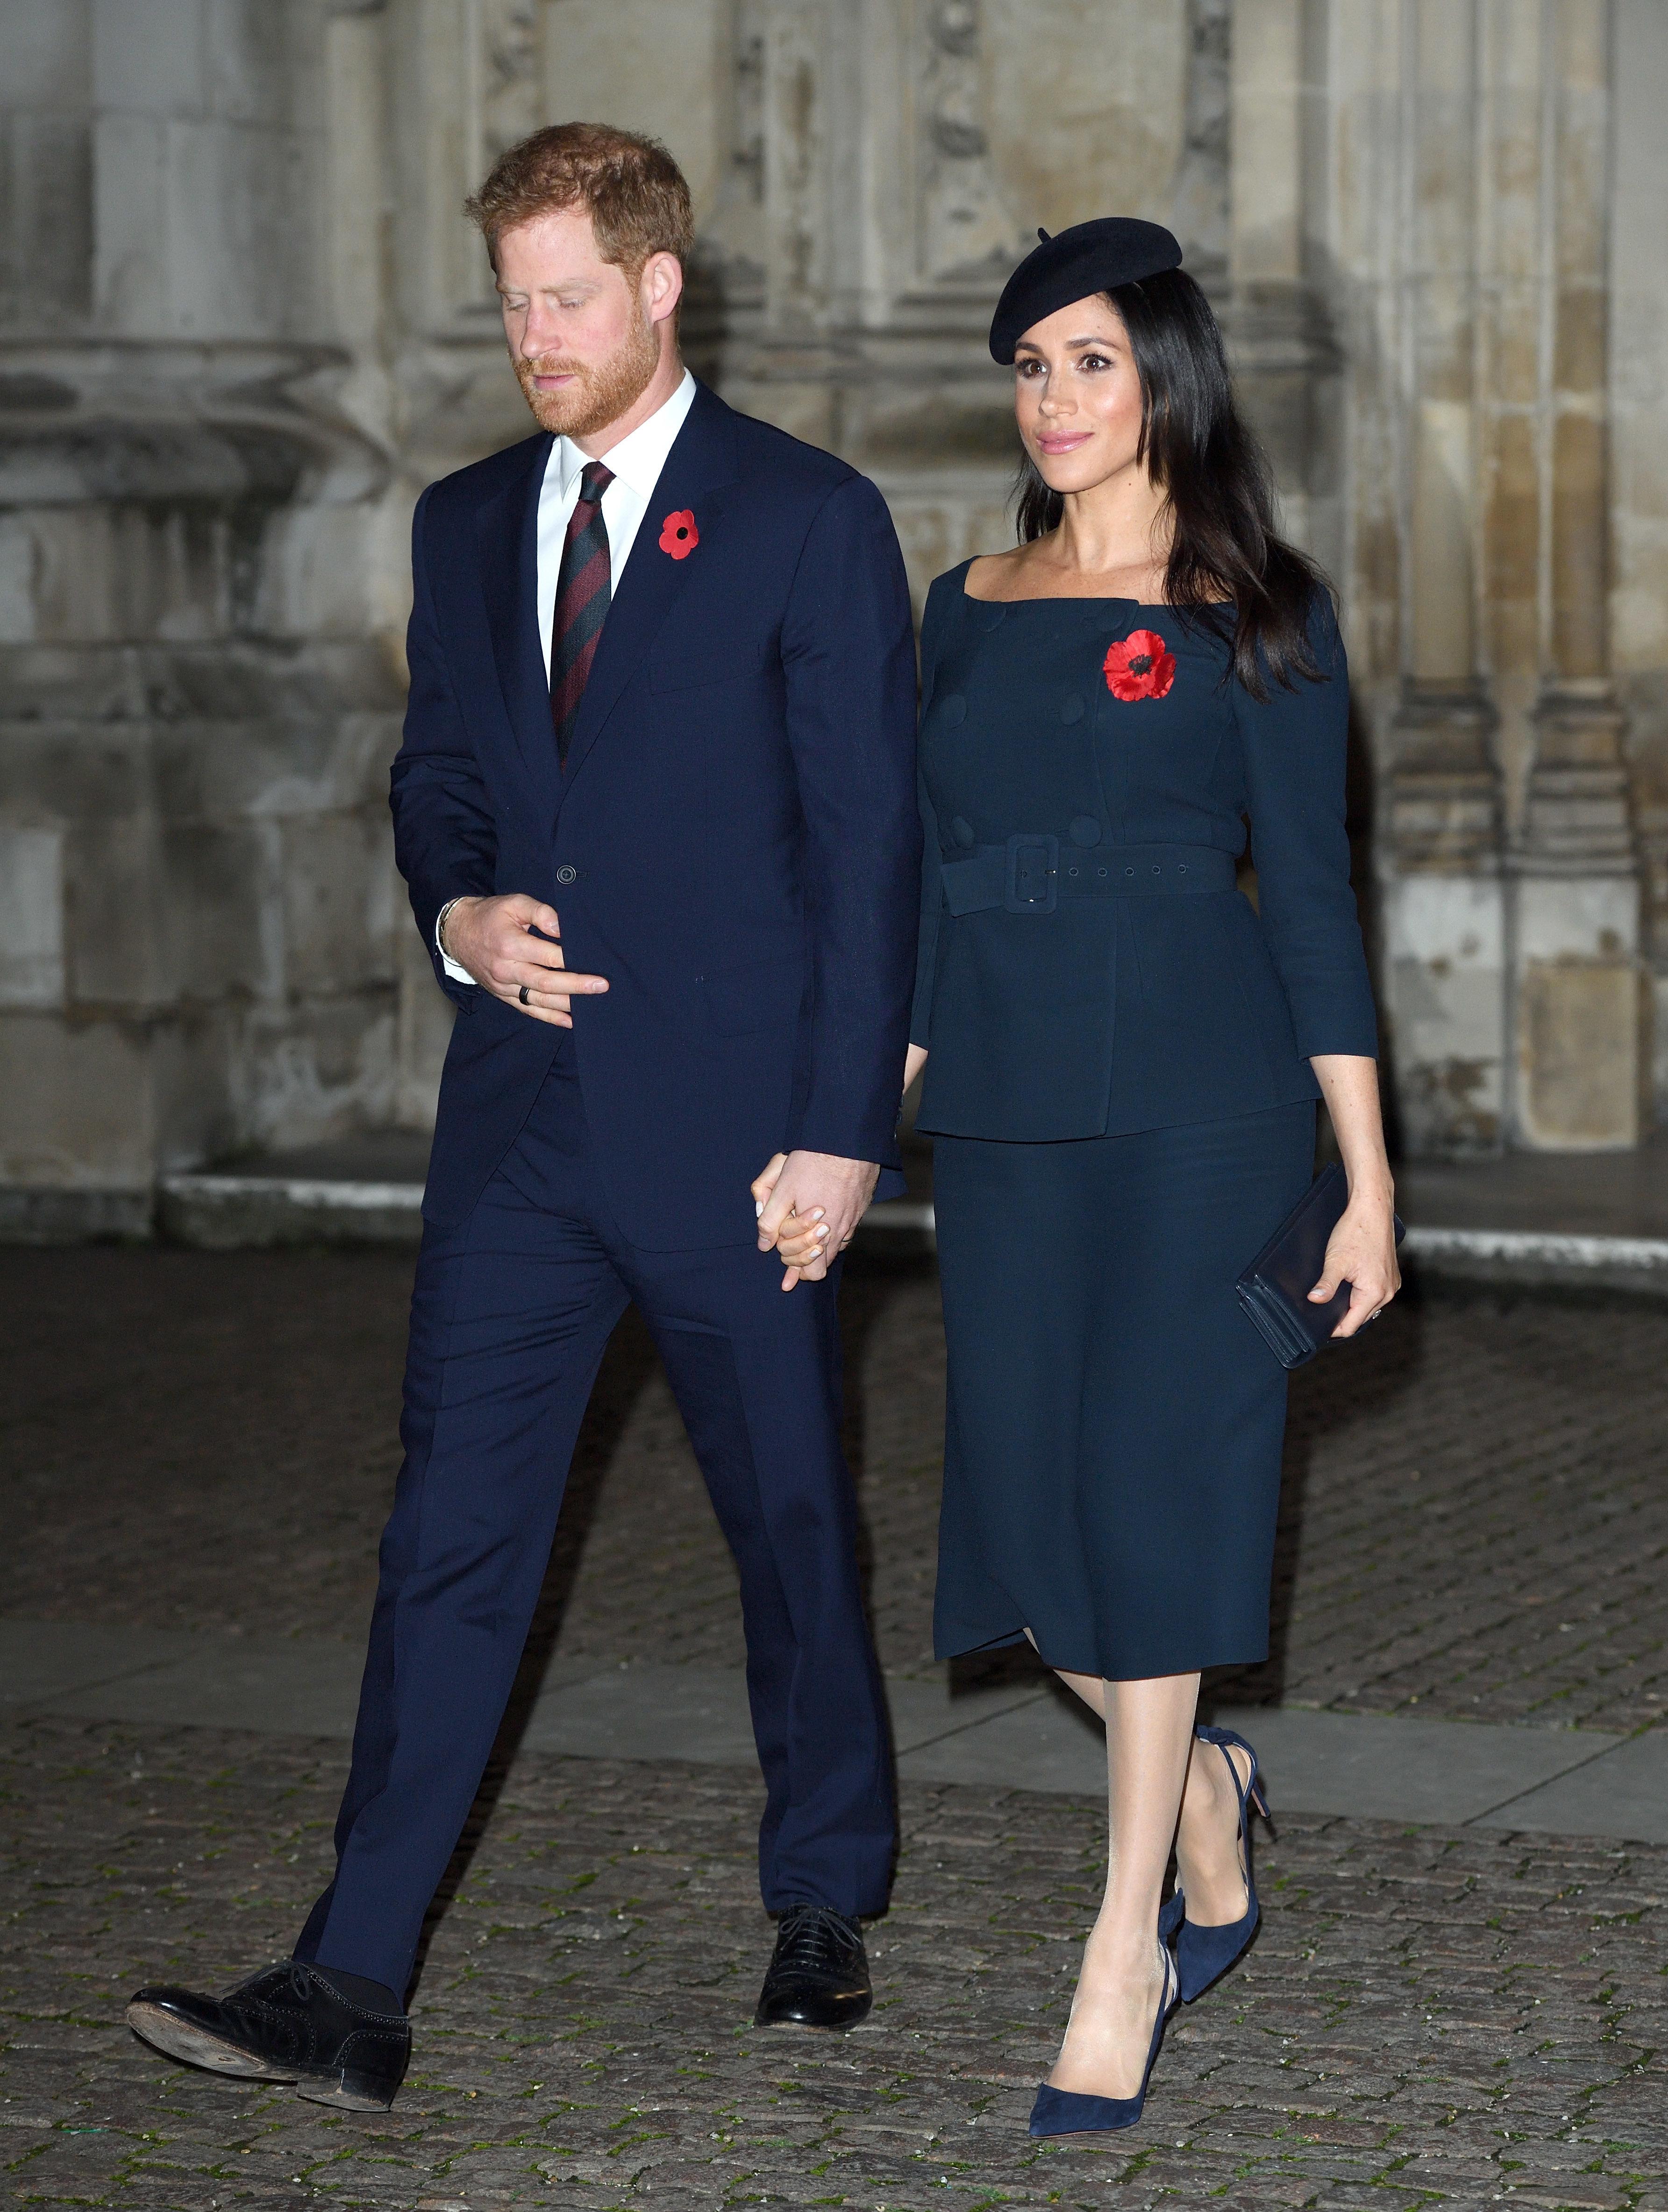 Herzogin Meghan soll Prinz Harry stark verändern wollen.